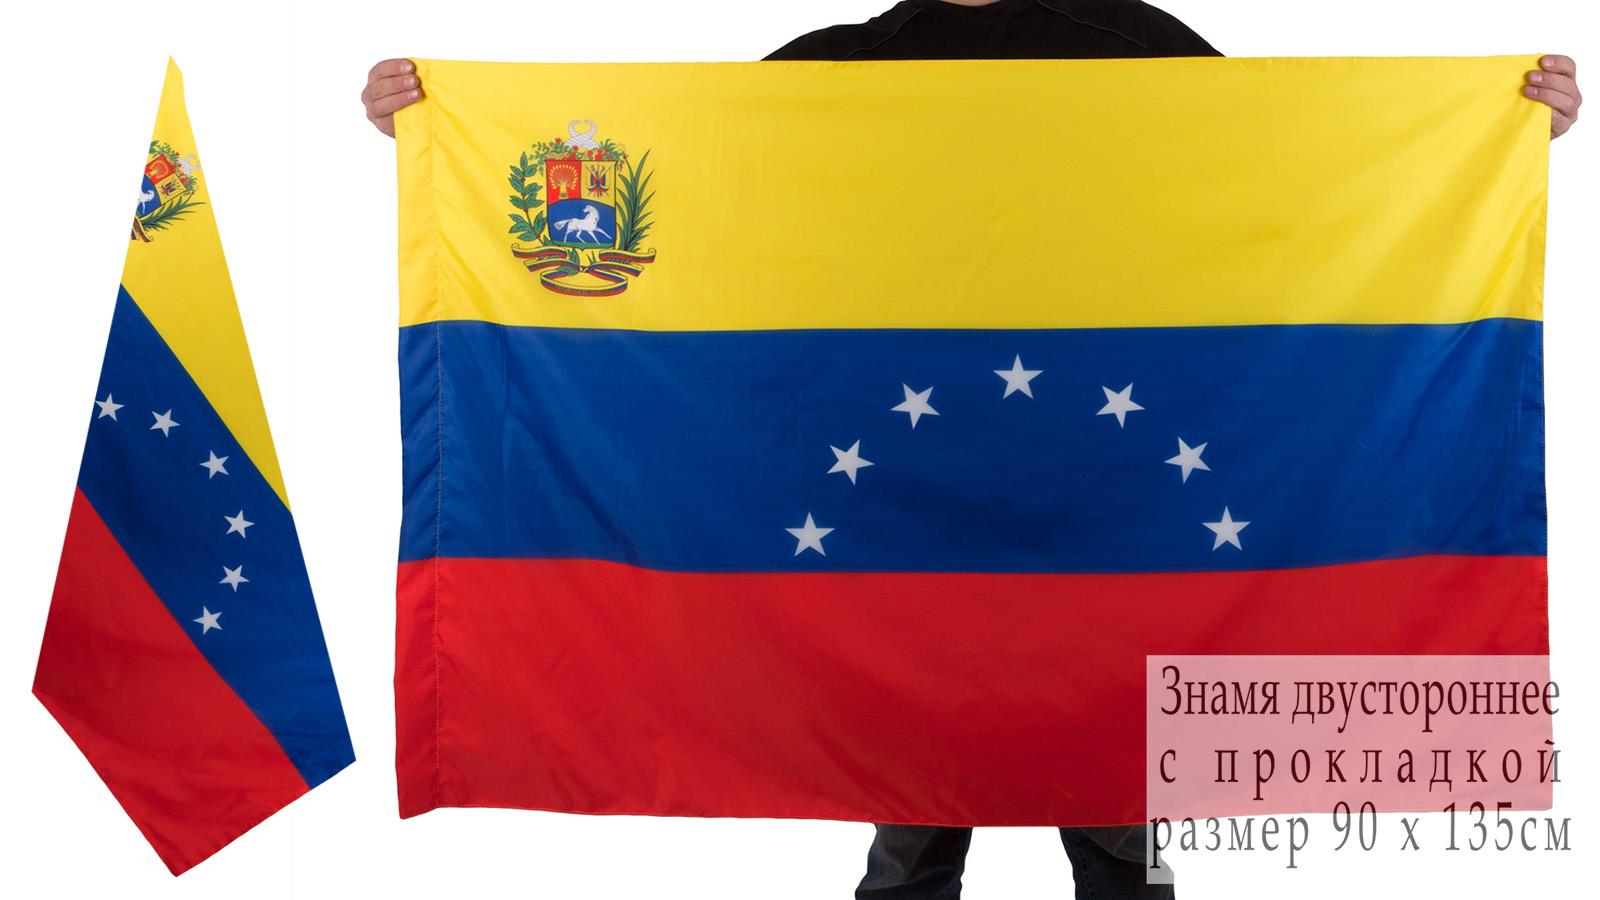 Государственный флаг Венесуэлы